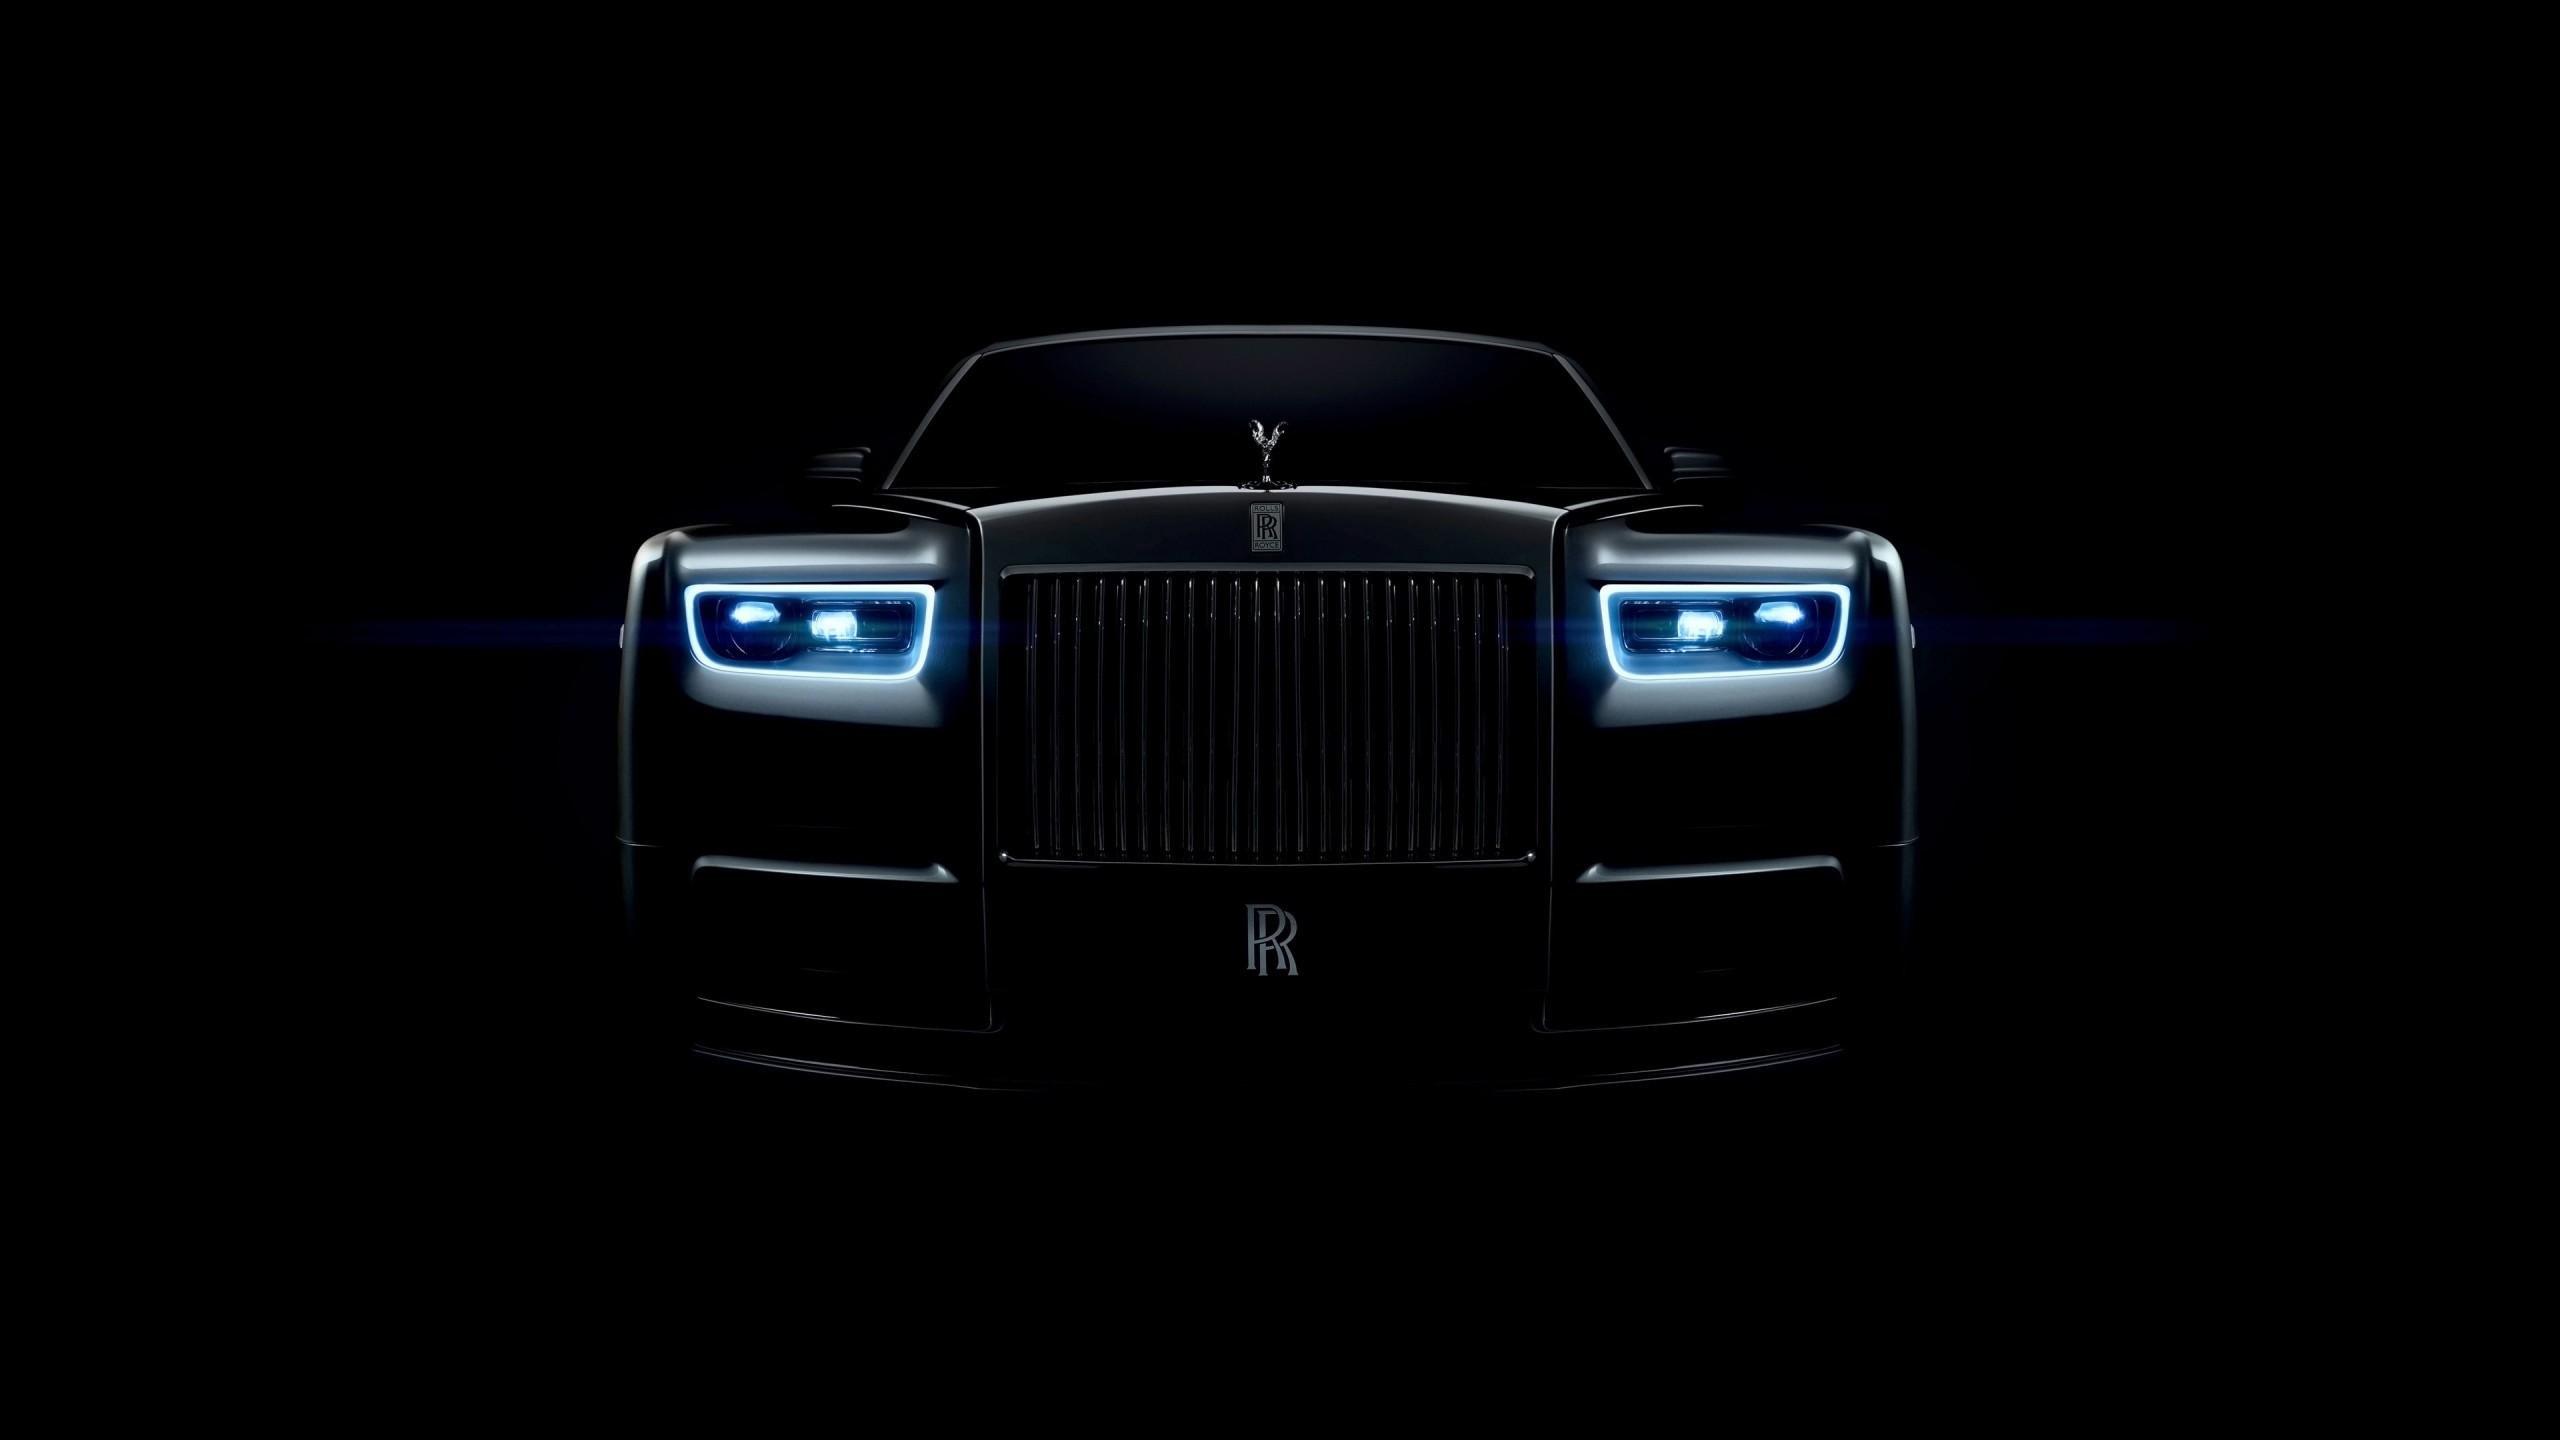 2018 rolls royce phantom wallpaper | hd car wallpapers | id #8172